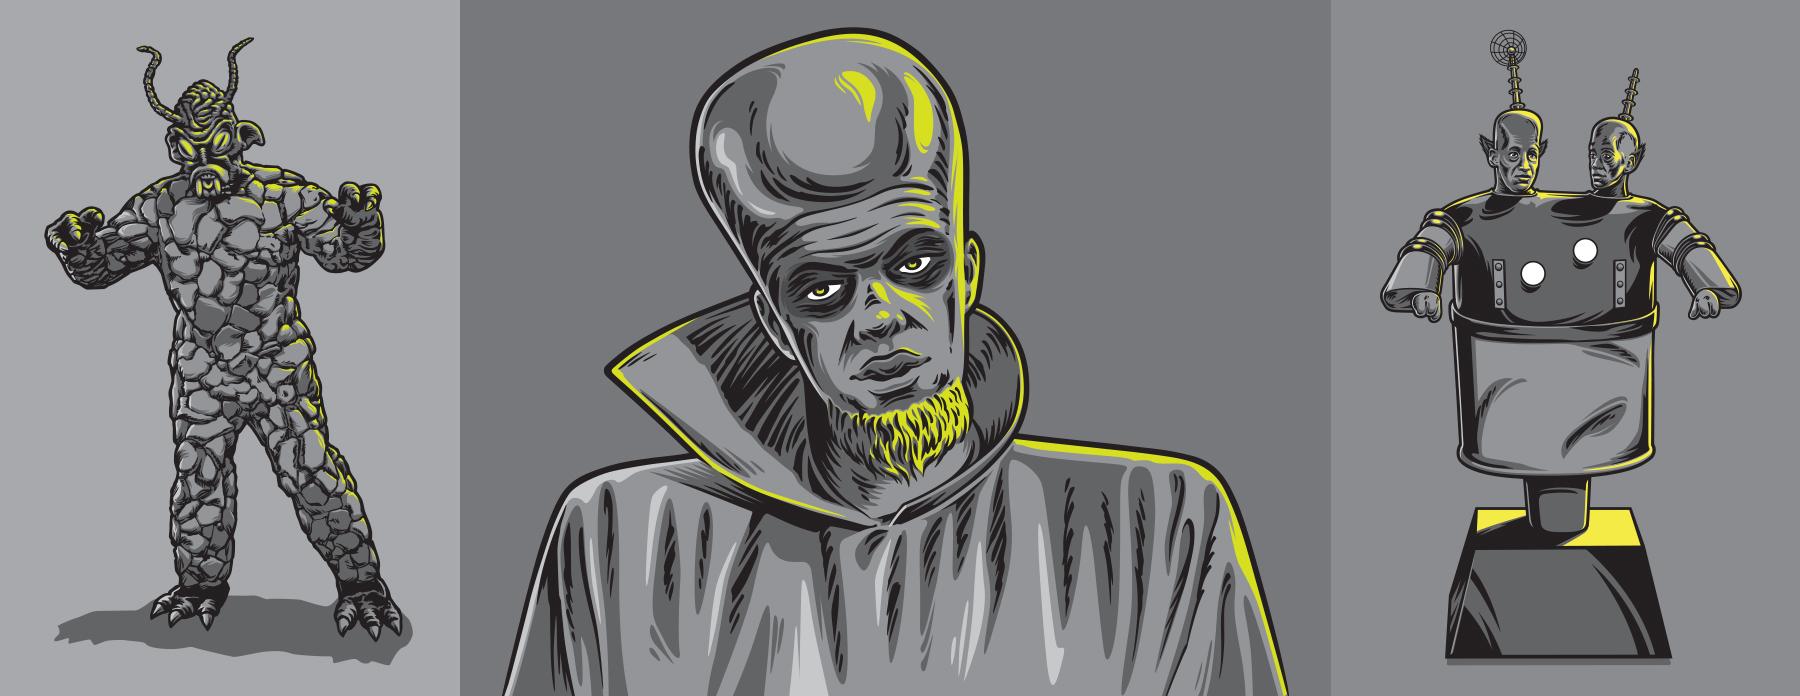 The Twilight Zone Illustrations - ID 2